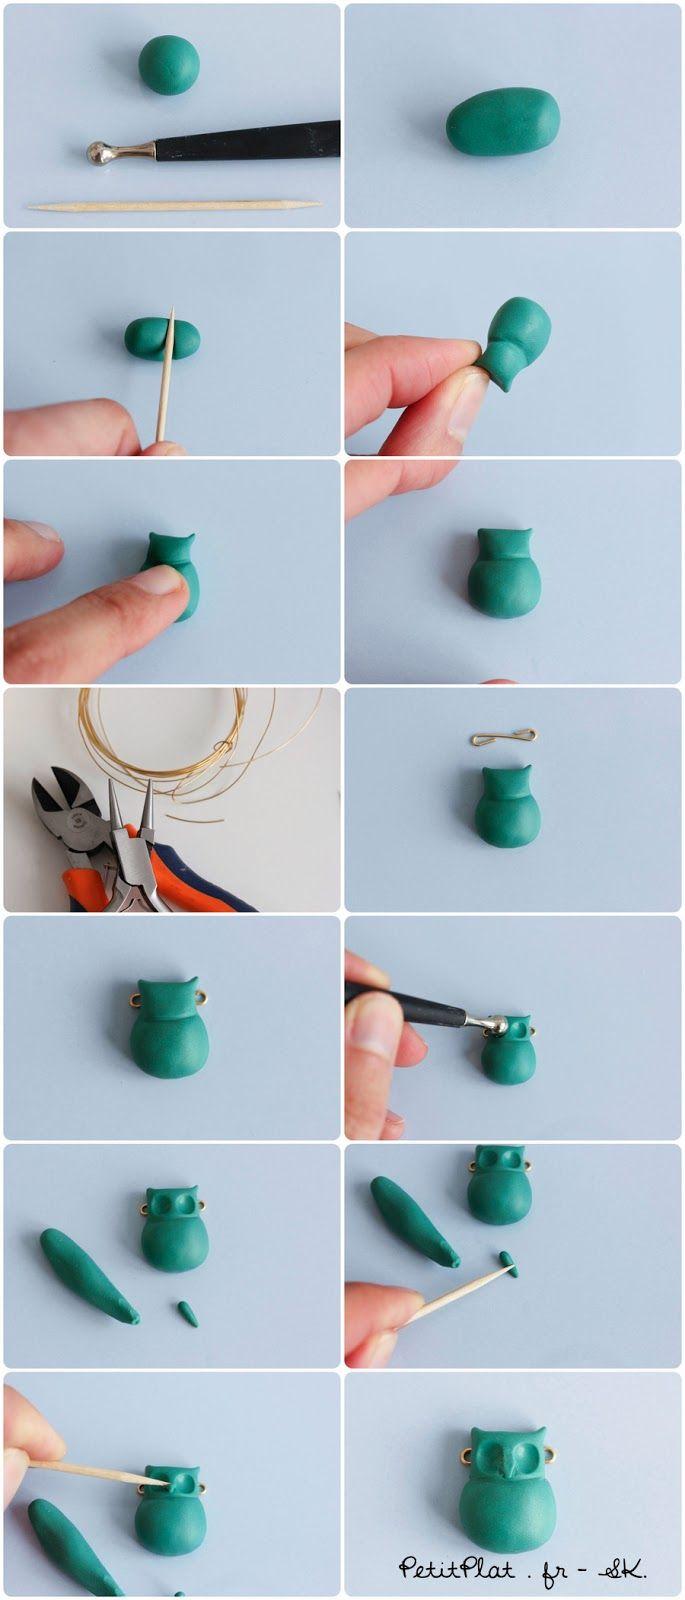 PetitPlat Miniatures by Stephanie Kilgast: DIY Owl Necklace - Polymer Clay